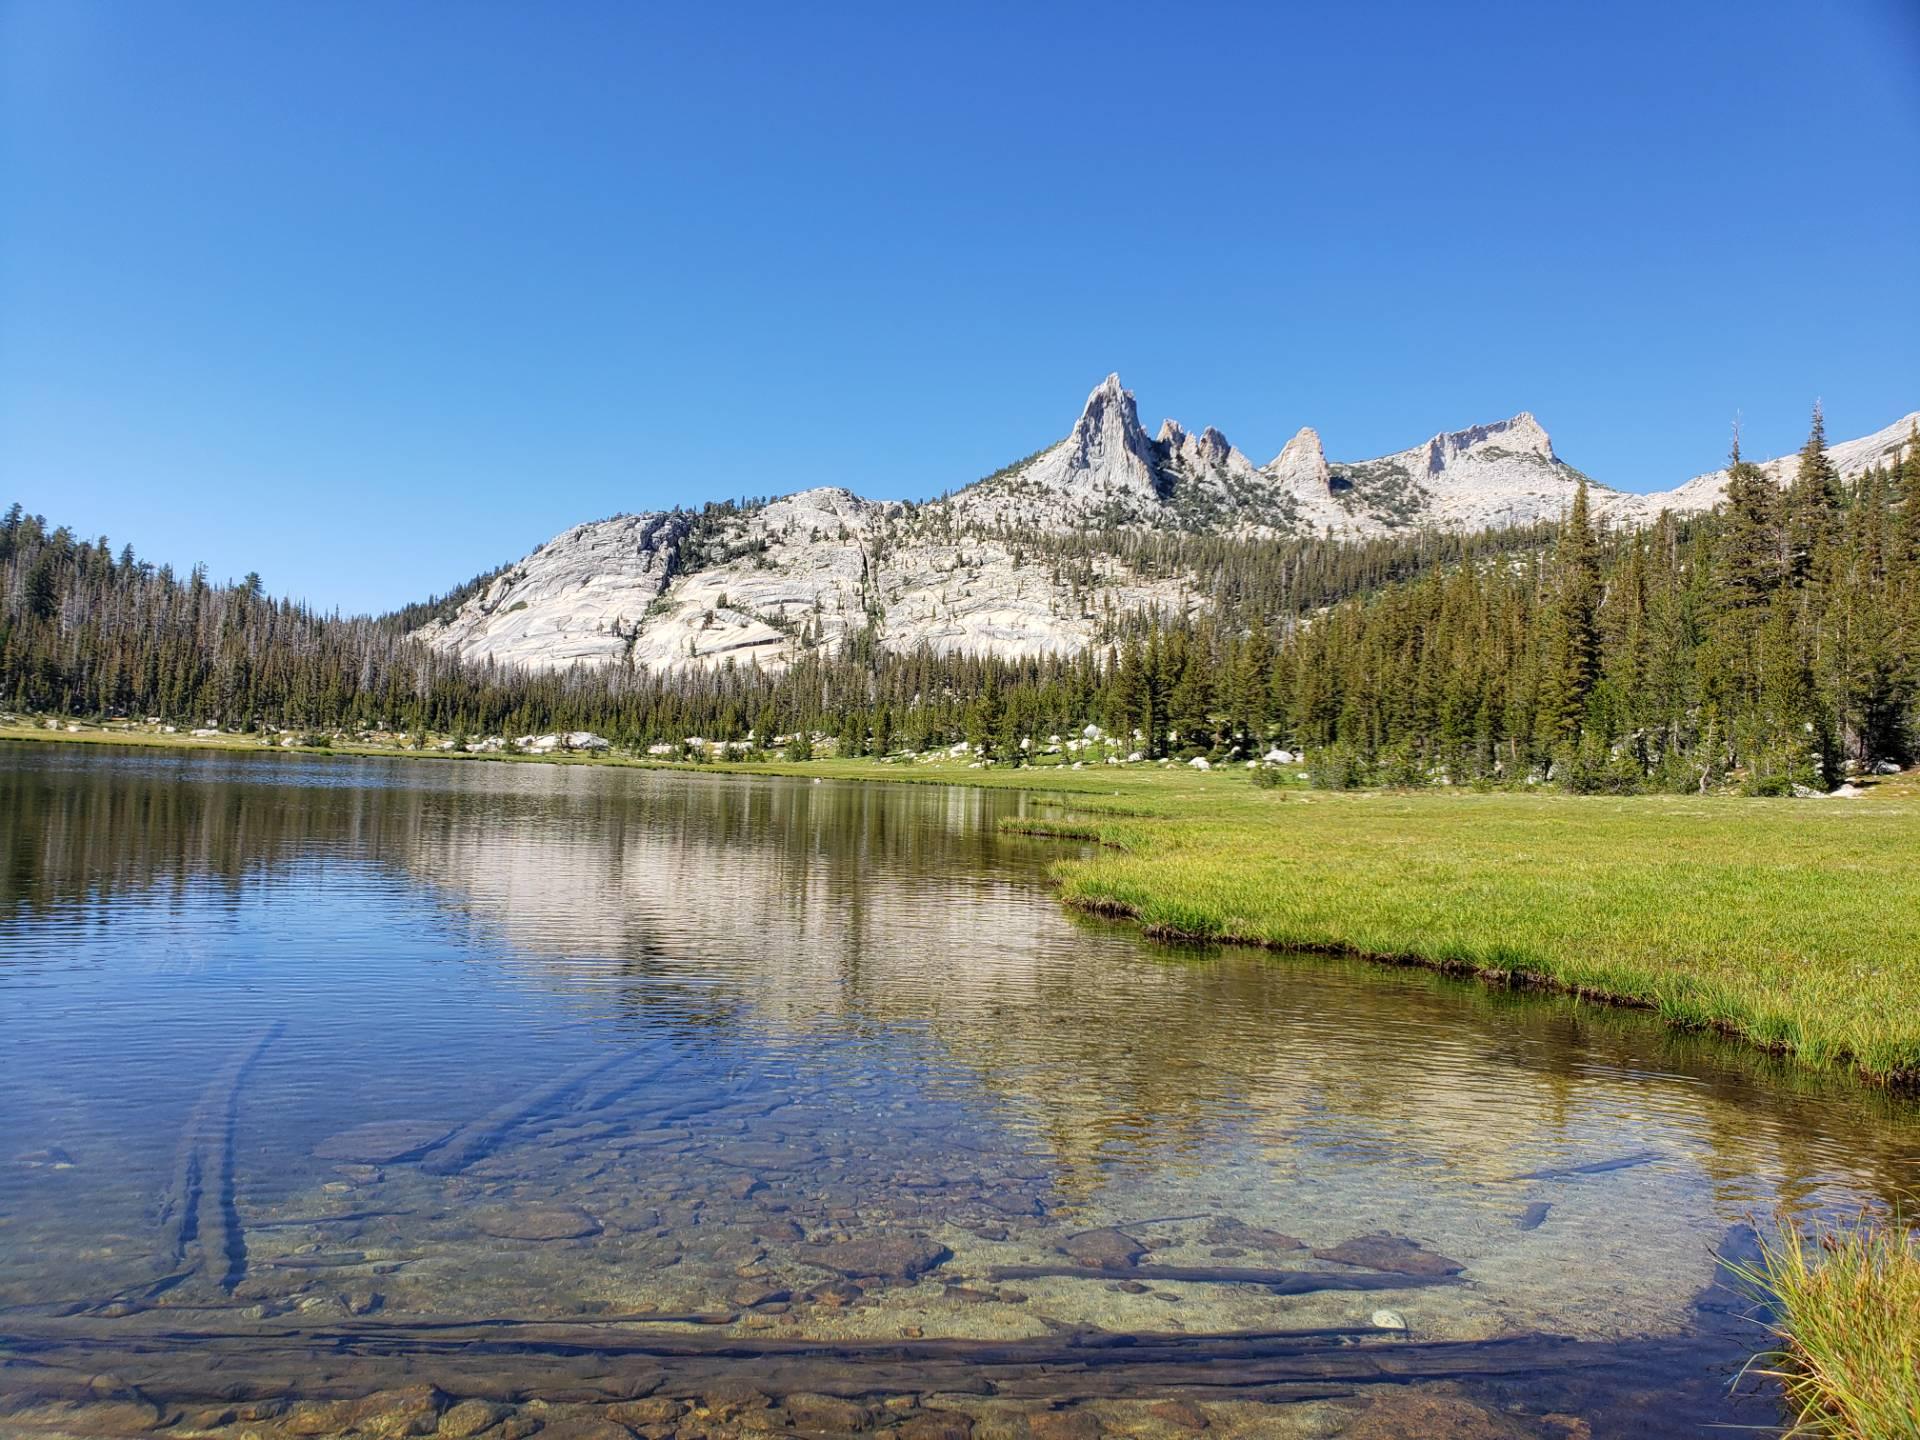 Echo-Lake-and-Peak-yosemite-2019